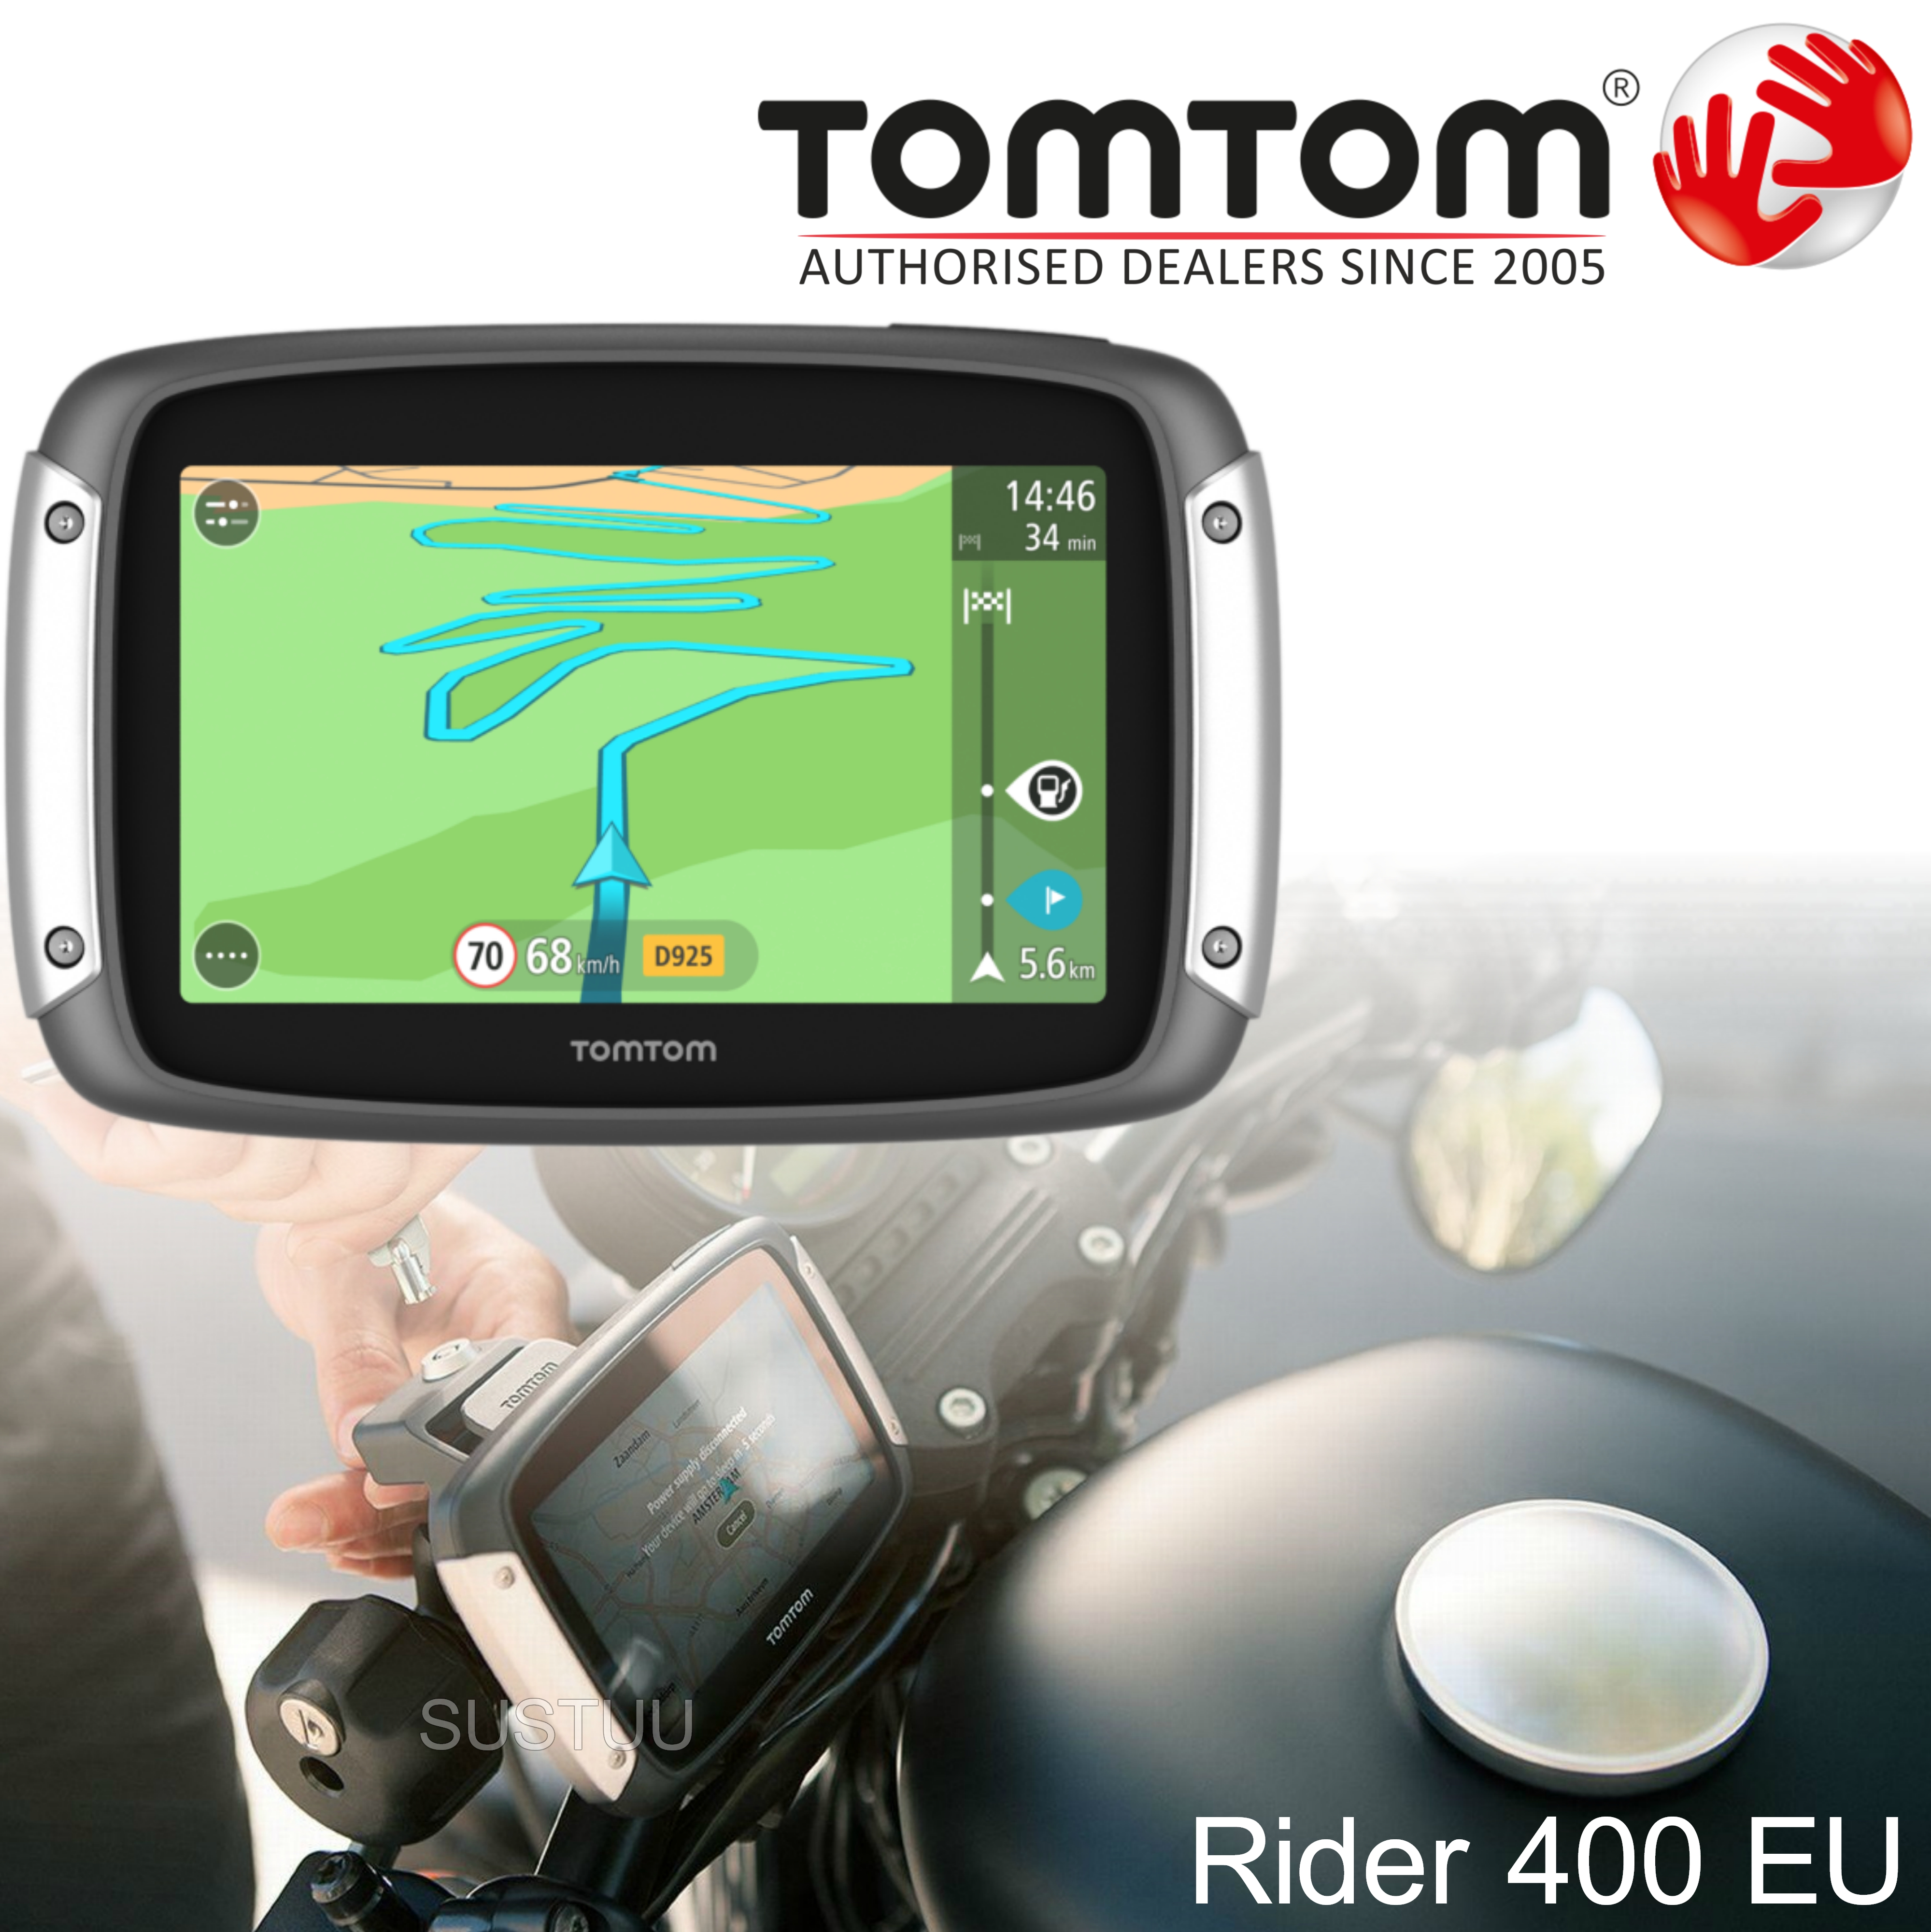 Tomtom Rider 400eu 2015 V6 Motorcycle GPS SATNAV Lifetime UK Europe 45 Maps